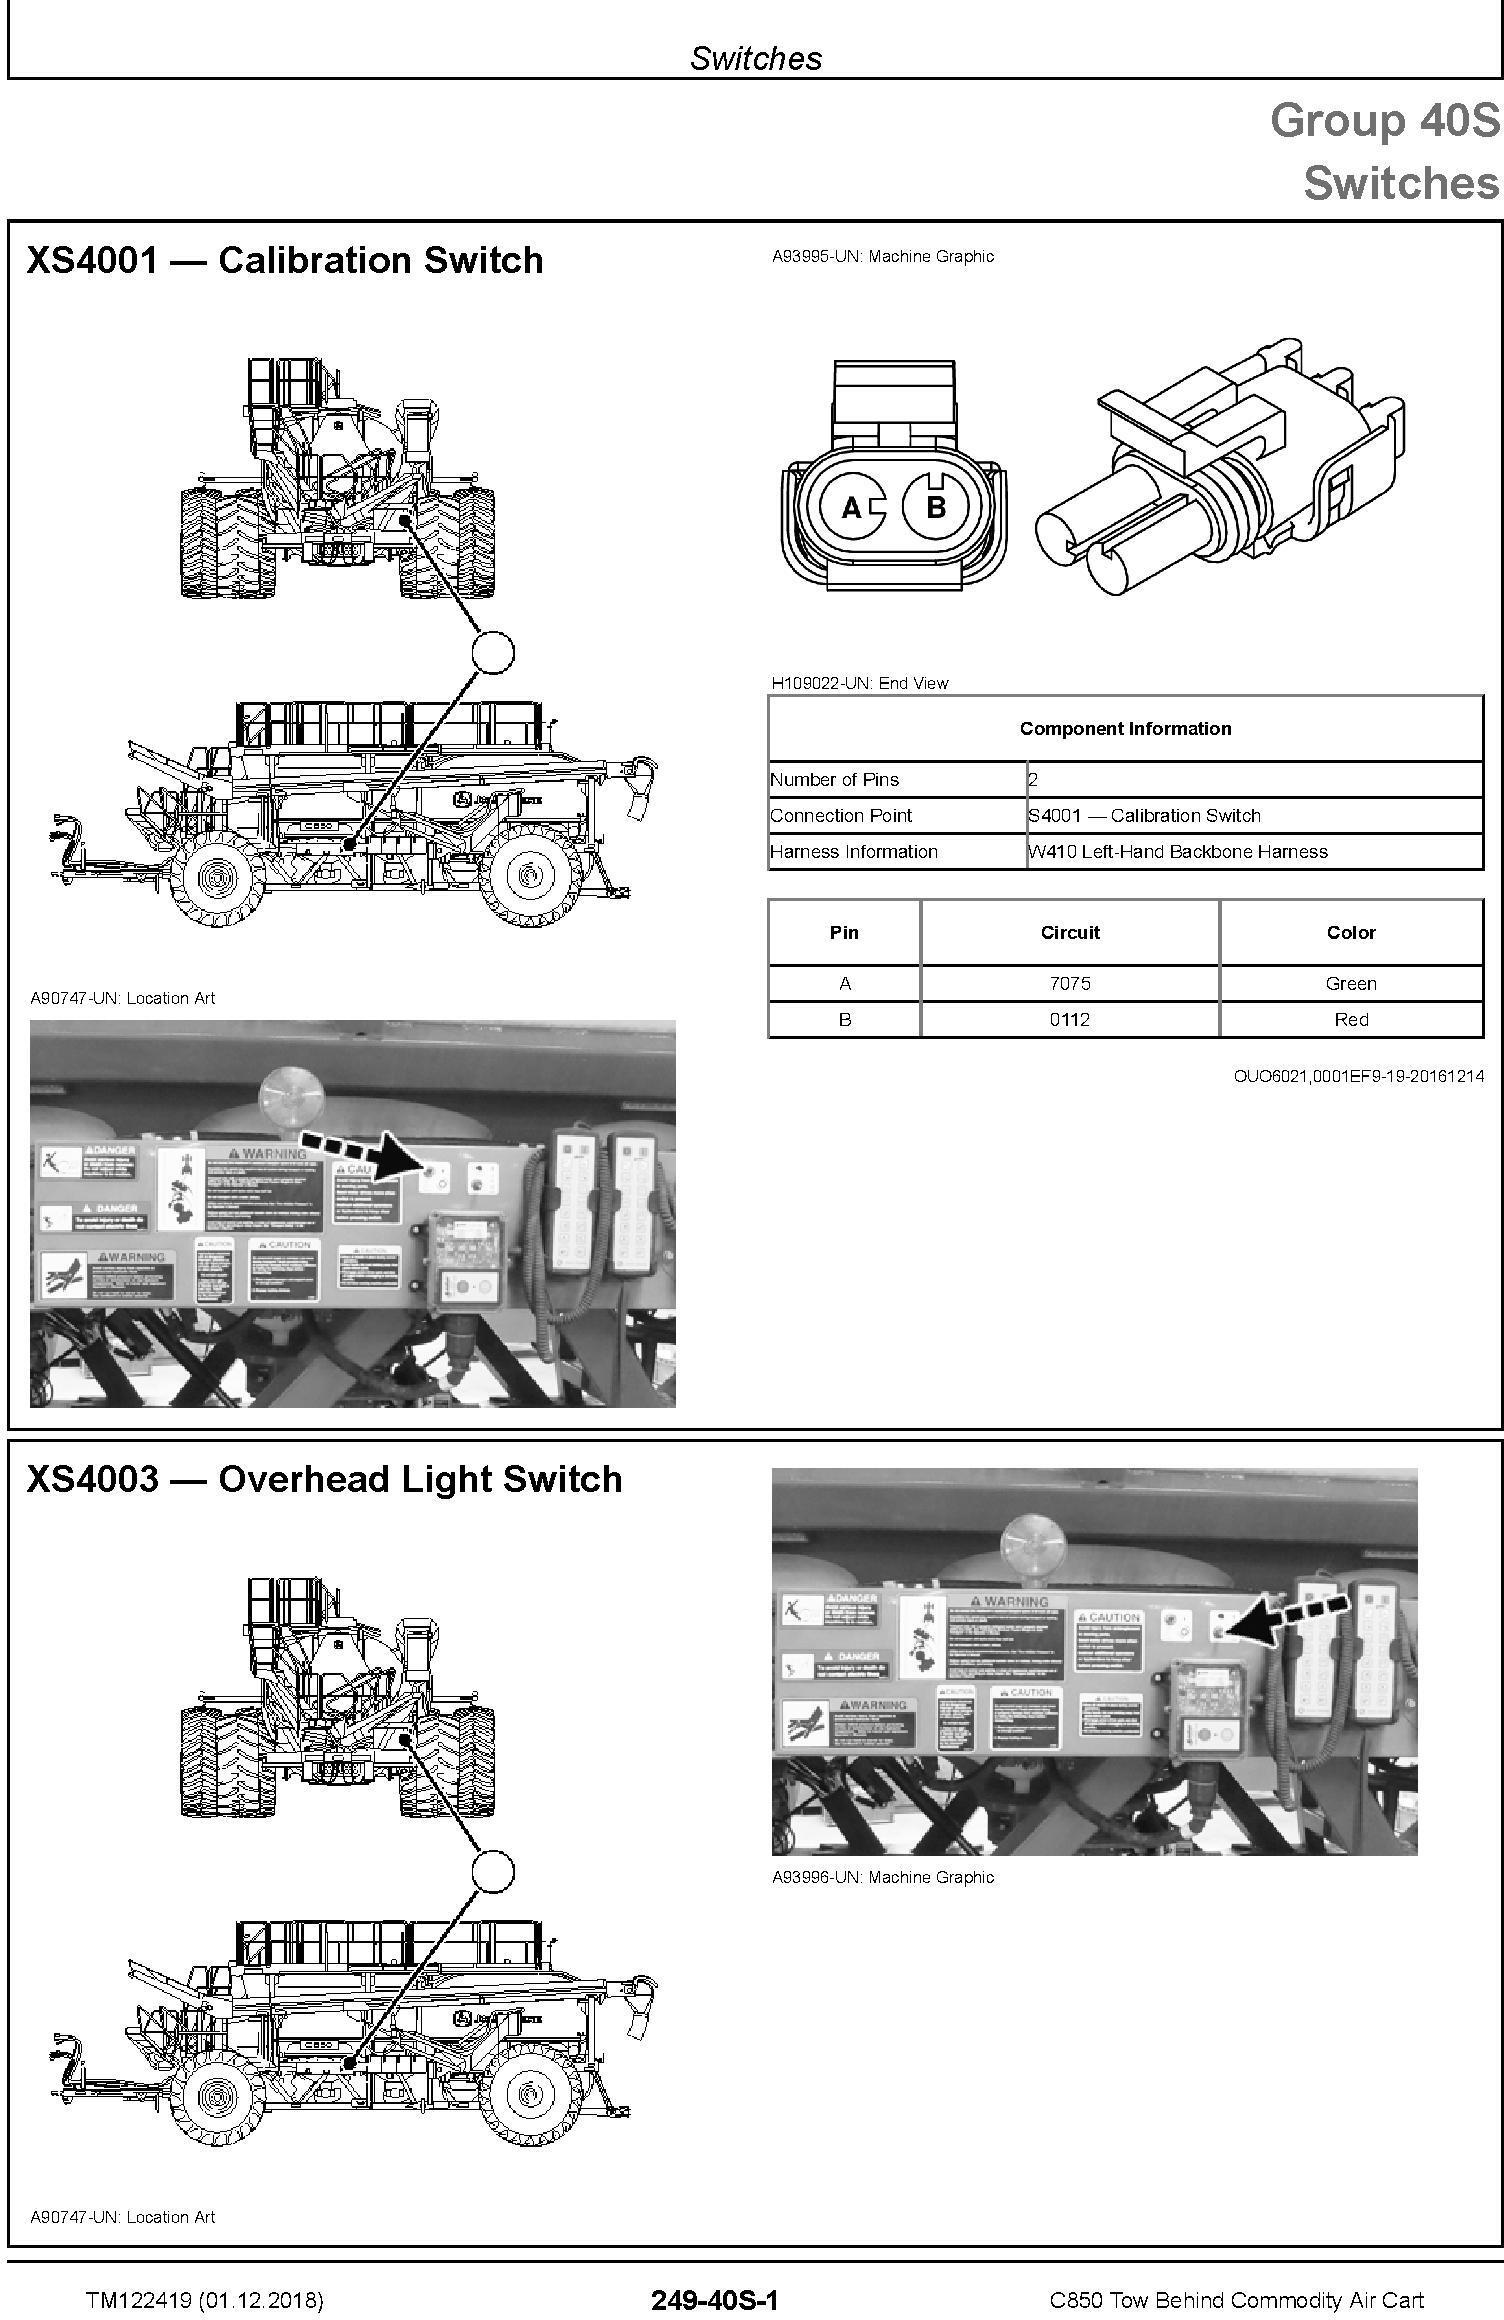 John Deere C850 Tow Behind Commodity Air Cart Diagnostic Technical Manual (TM122419) - 2